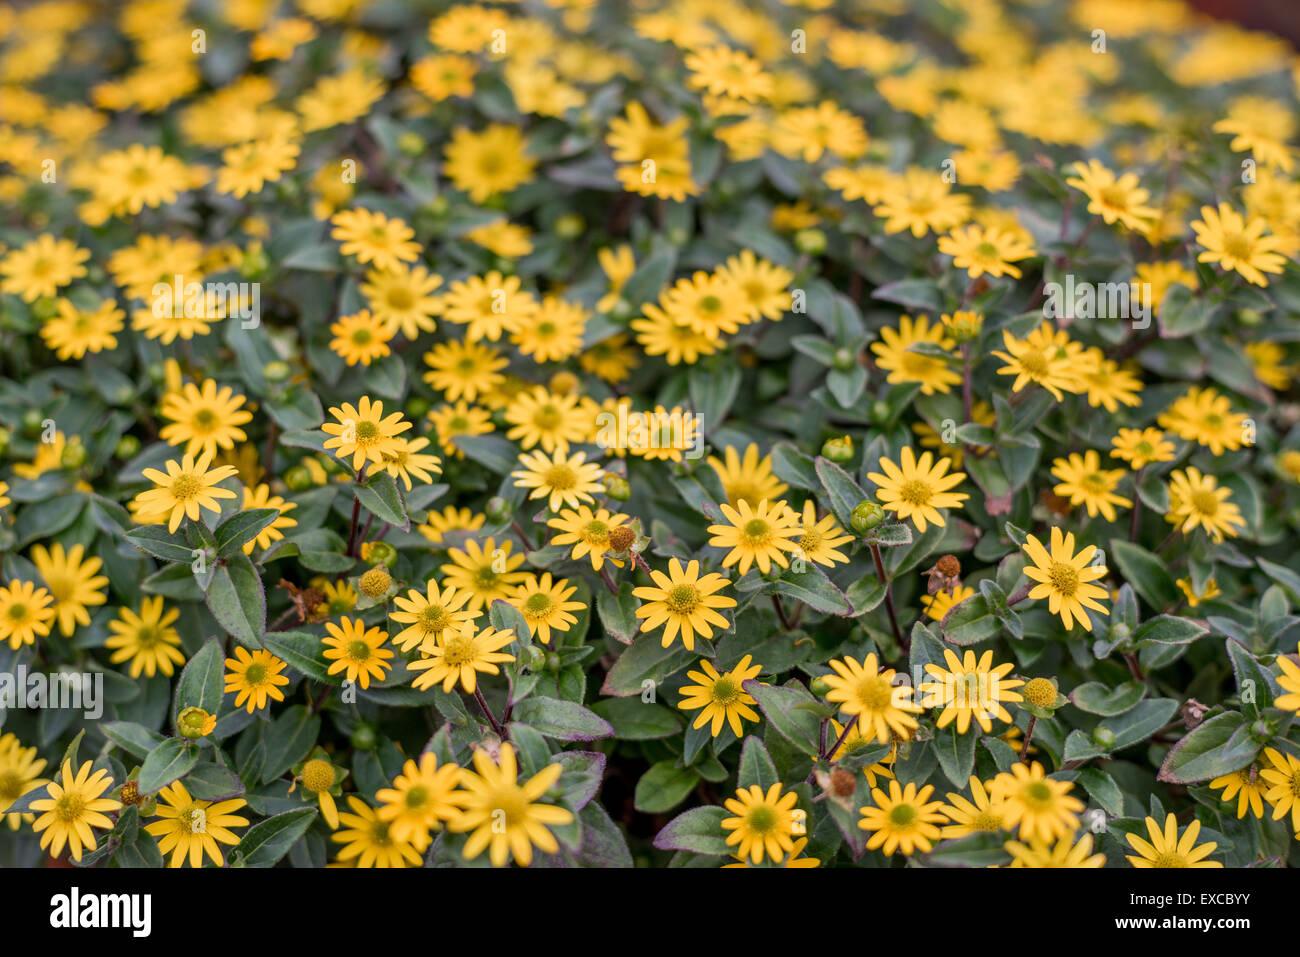 Creeping zinnias zinnia rich yellow flowers close up Sanvitalia speciosa Santiago yellow - Stock Image